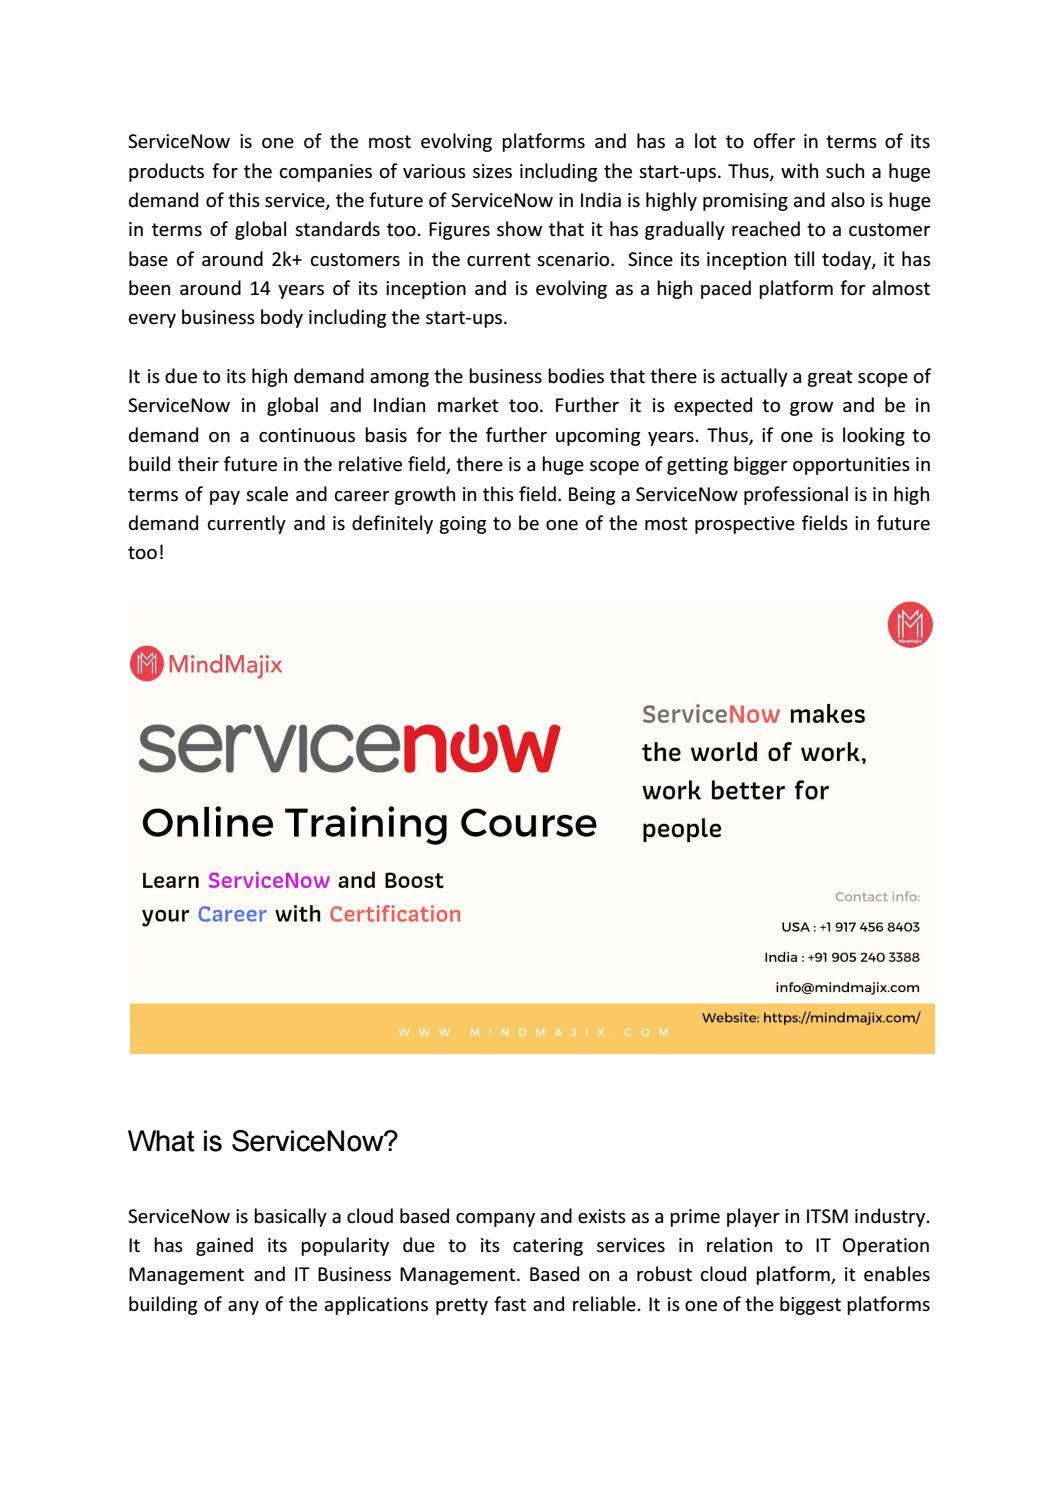 ServiceNow Future Career growth by Mindmajix by Nikhil john